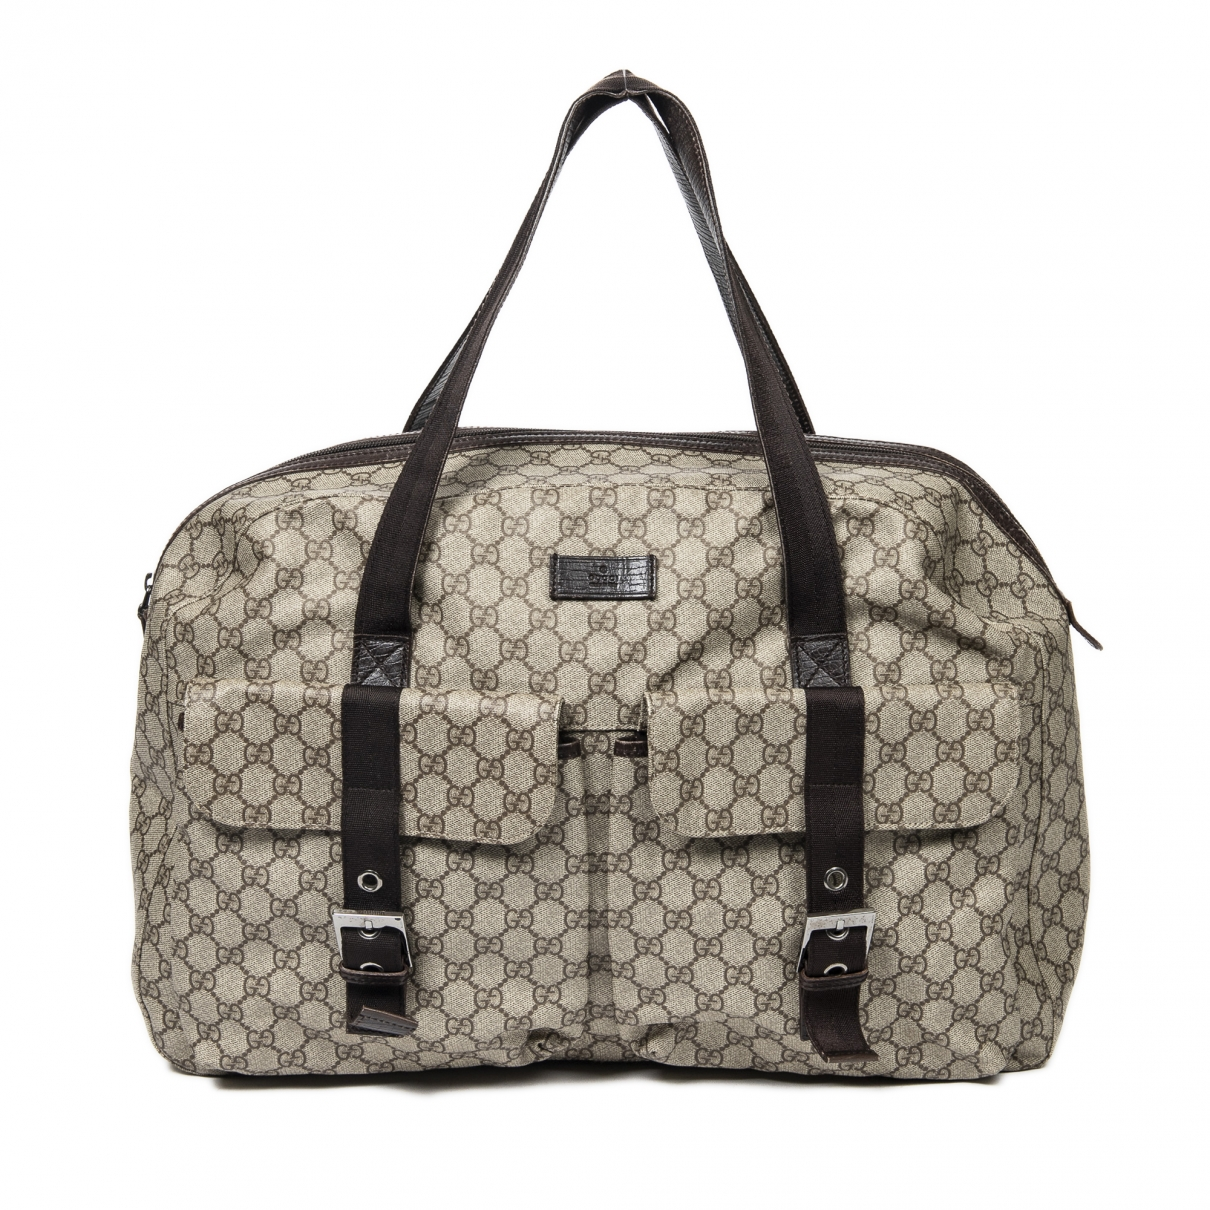 Gucci \N Brown Cotton Travel bag for Women \N